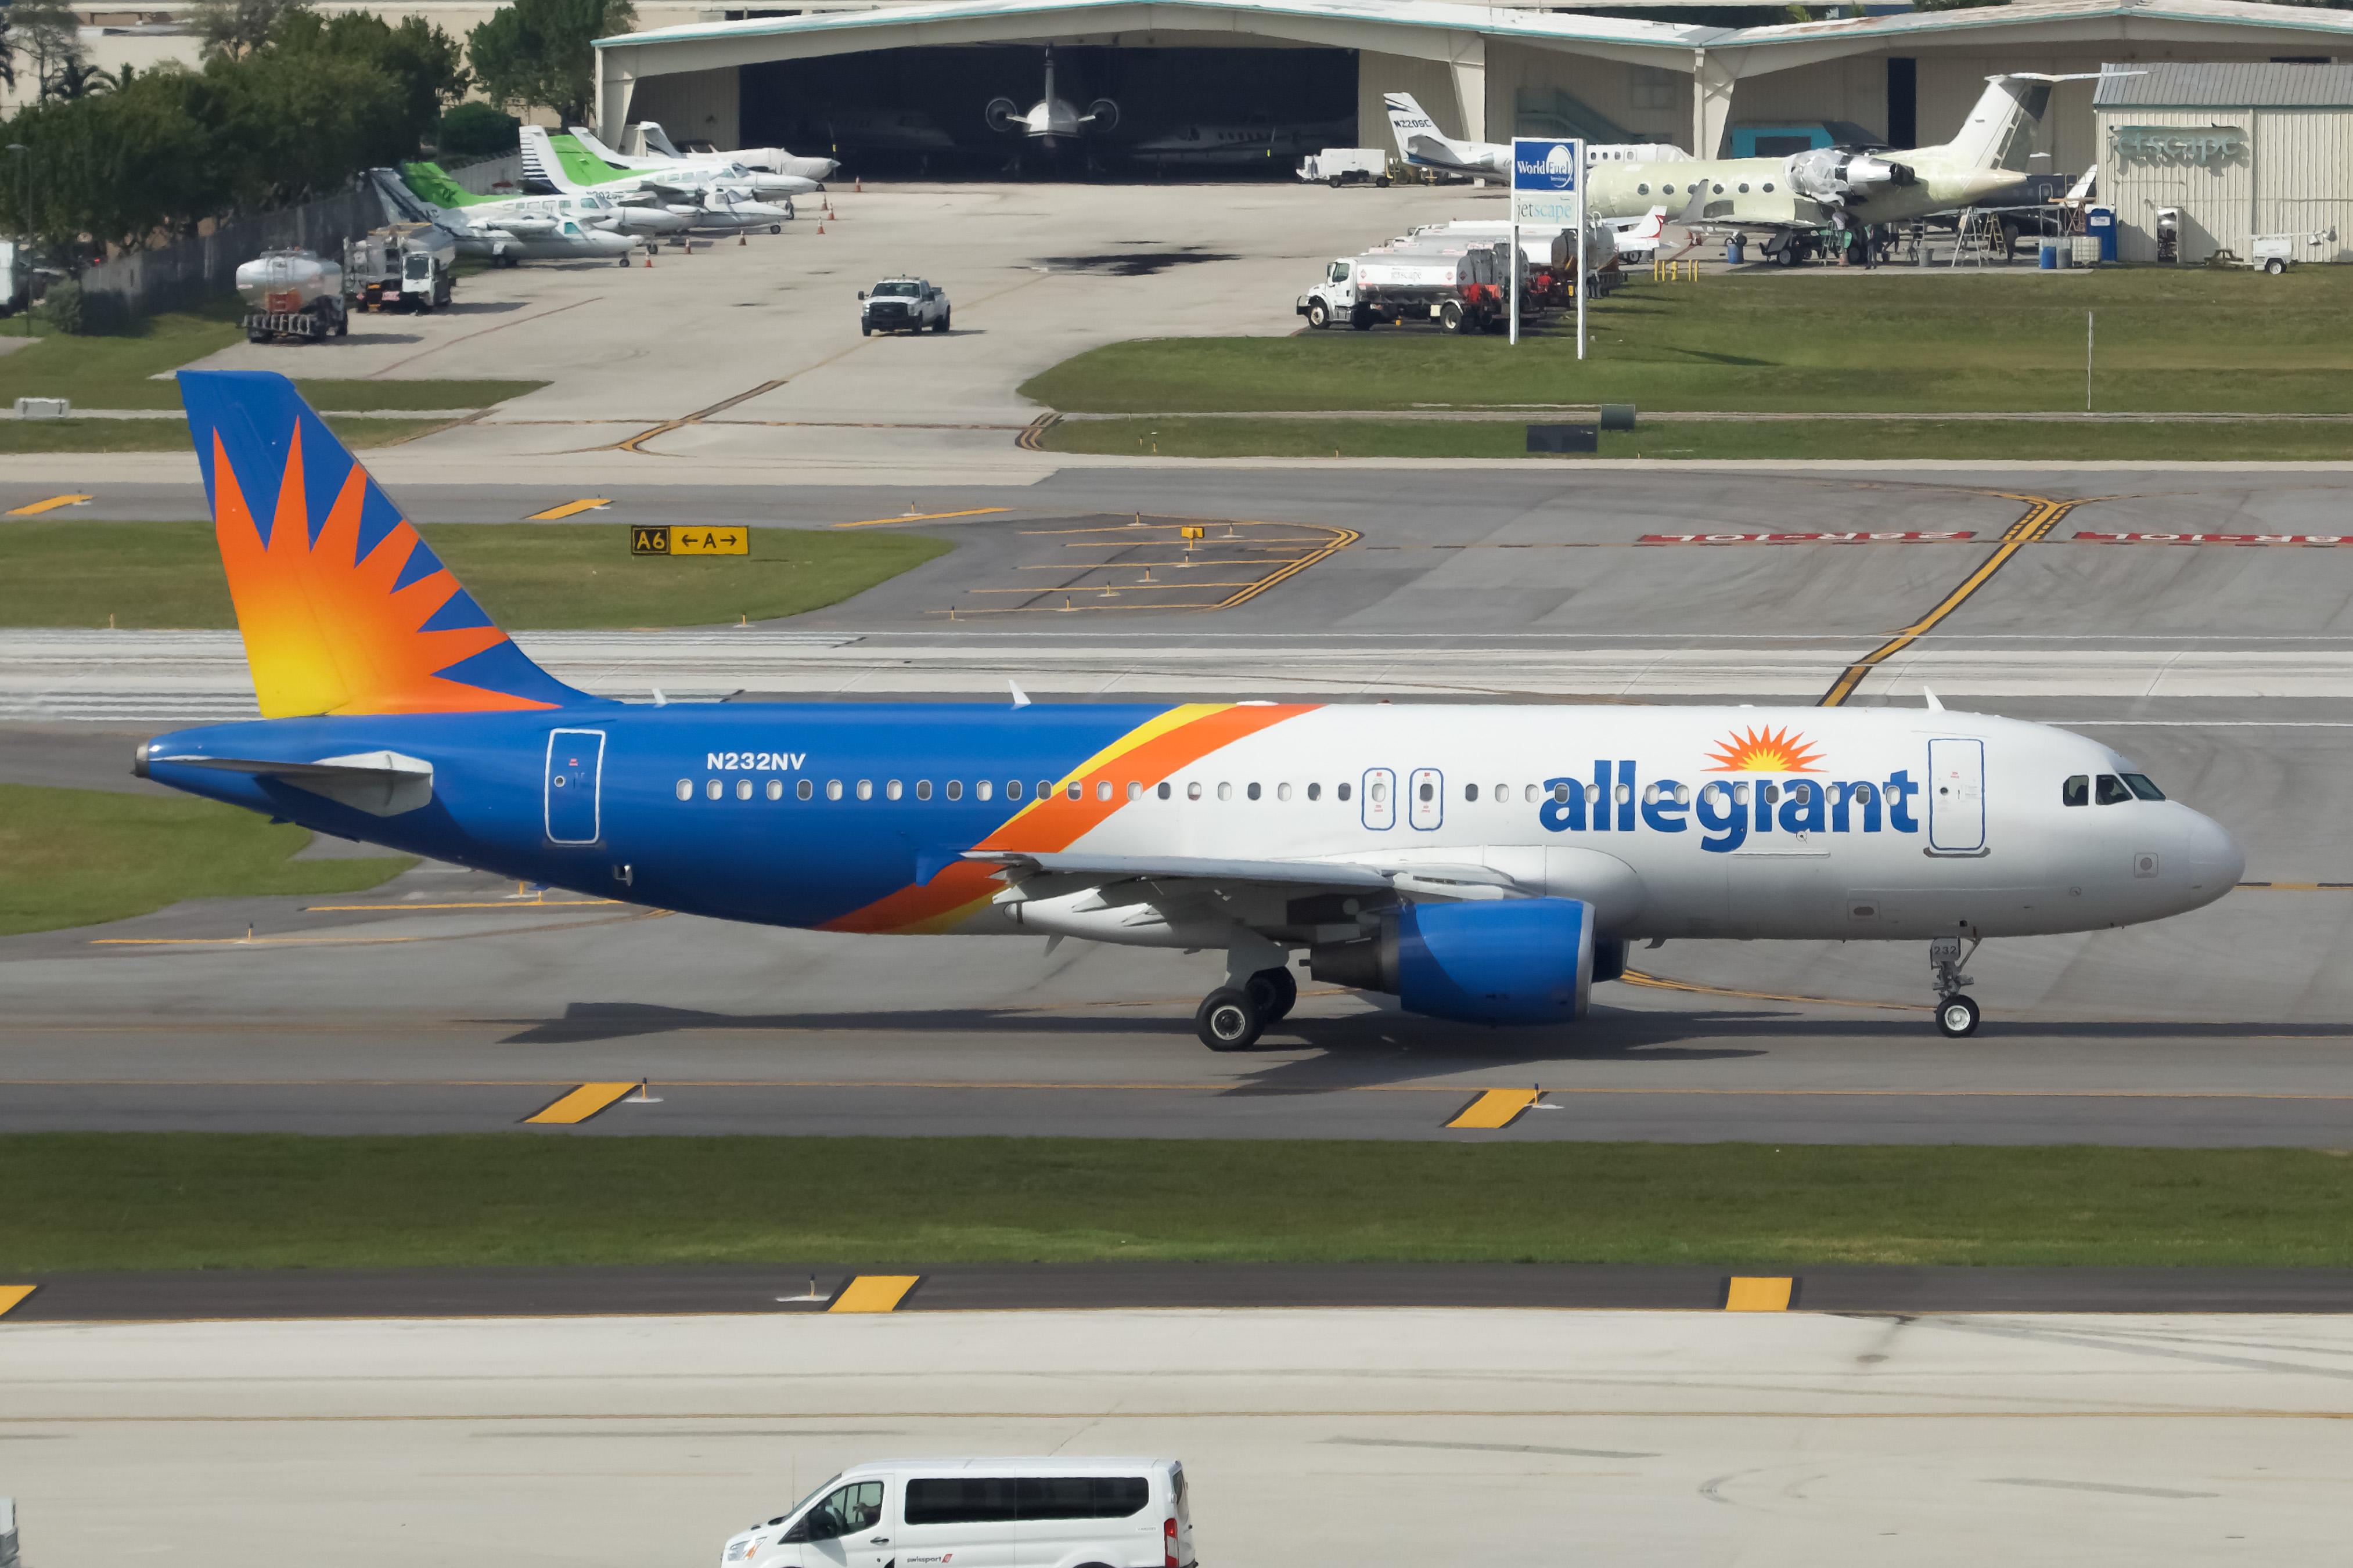 Photo of N253NV - Allegiant Air Airbus A320 at FLL